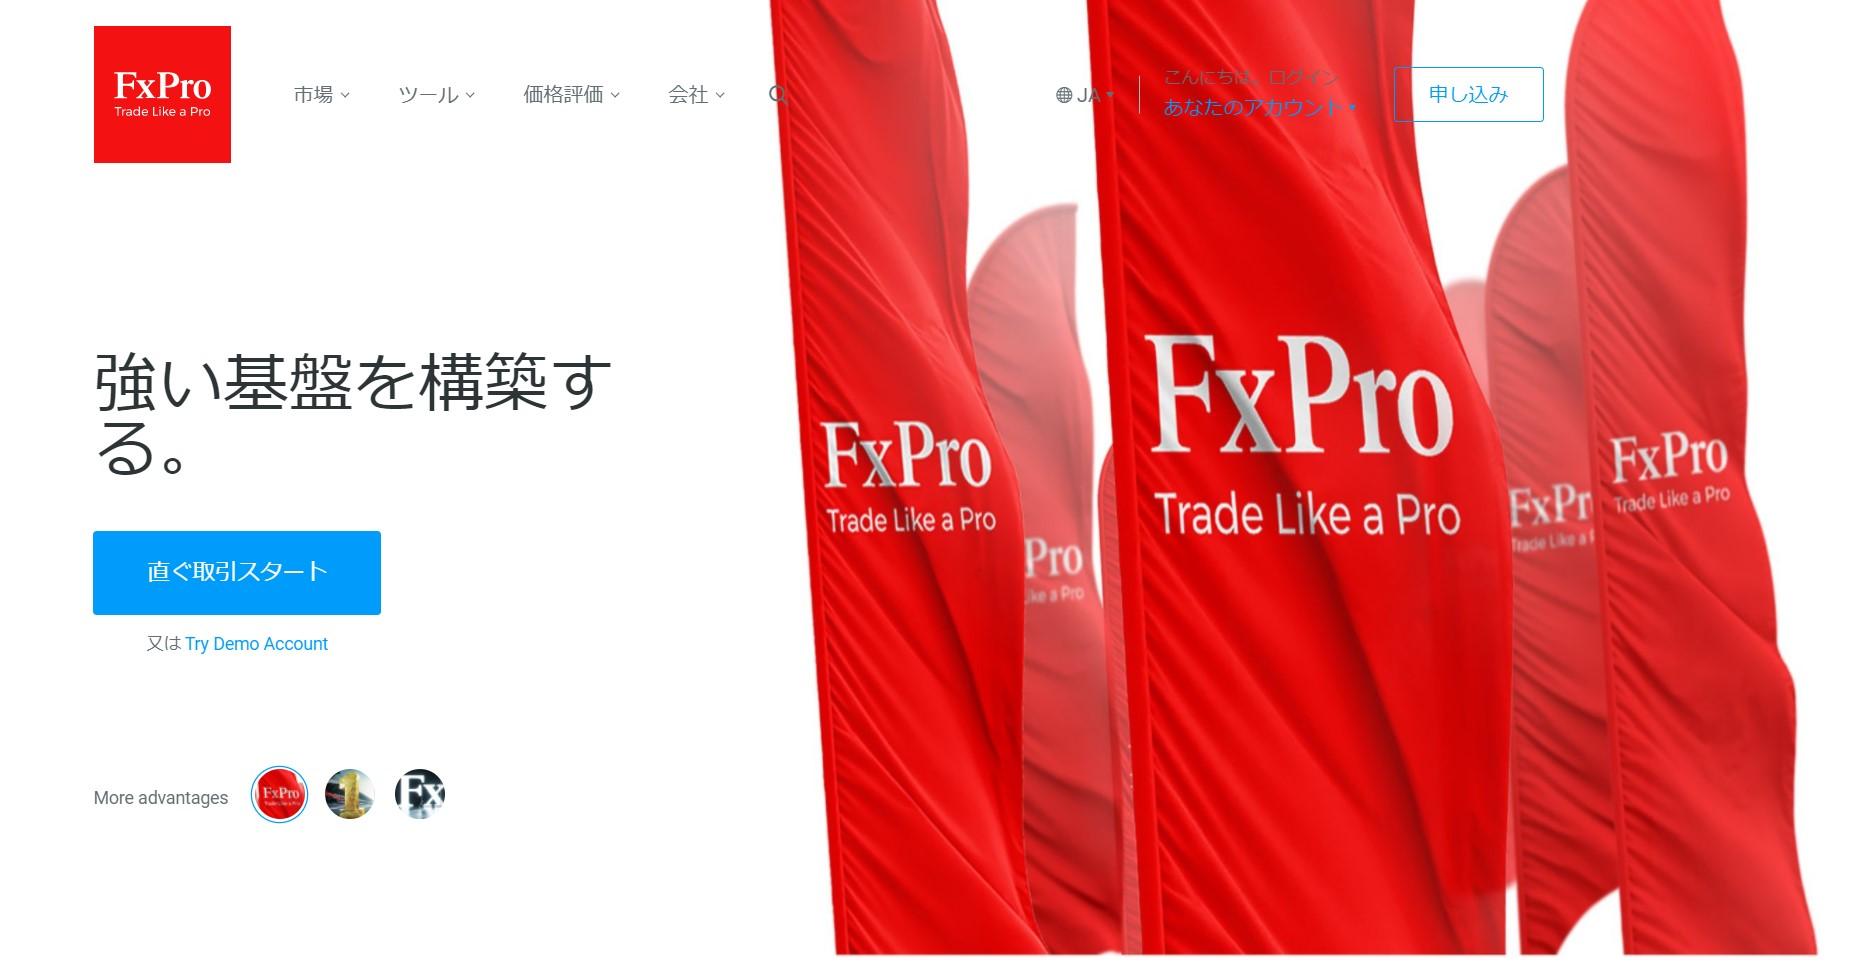 FxPro 入金方法